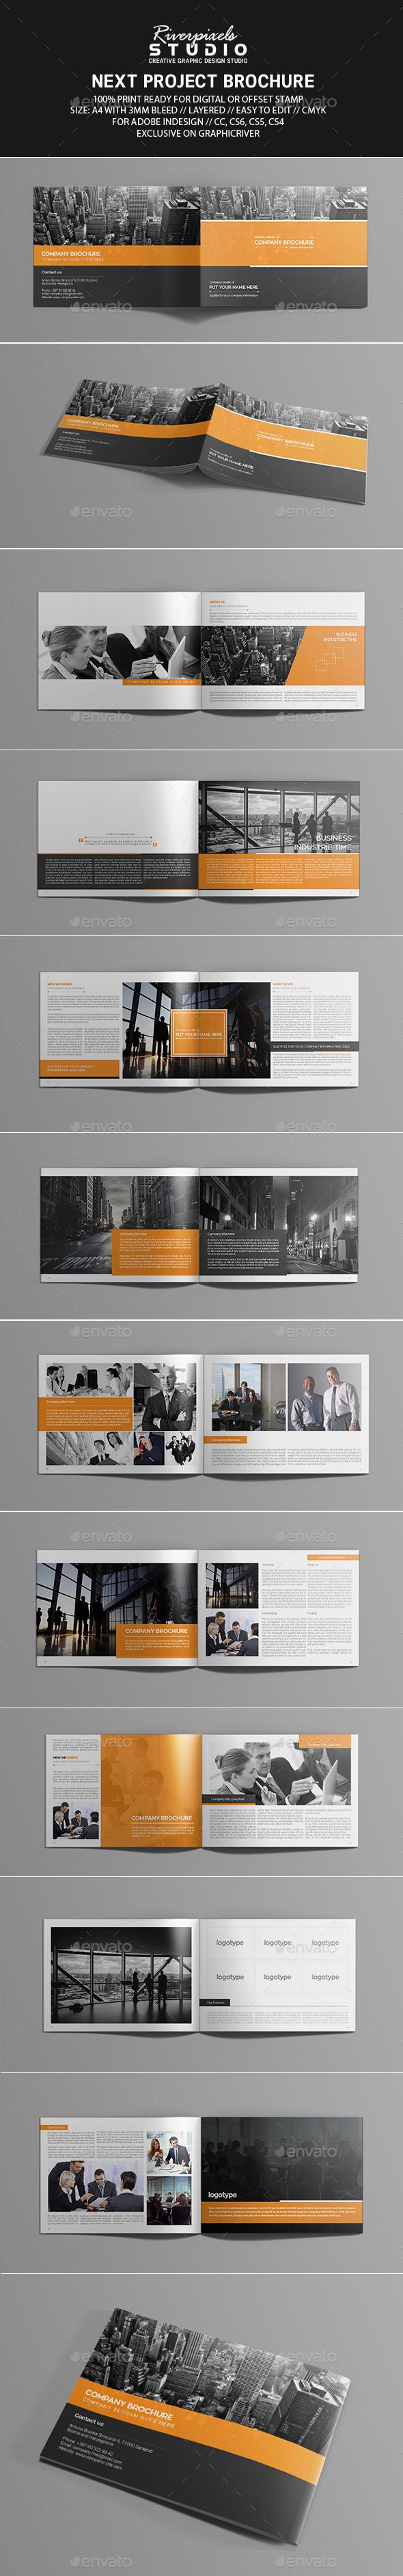 Next Project Brochure Template - Corporate Brochures